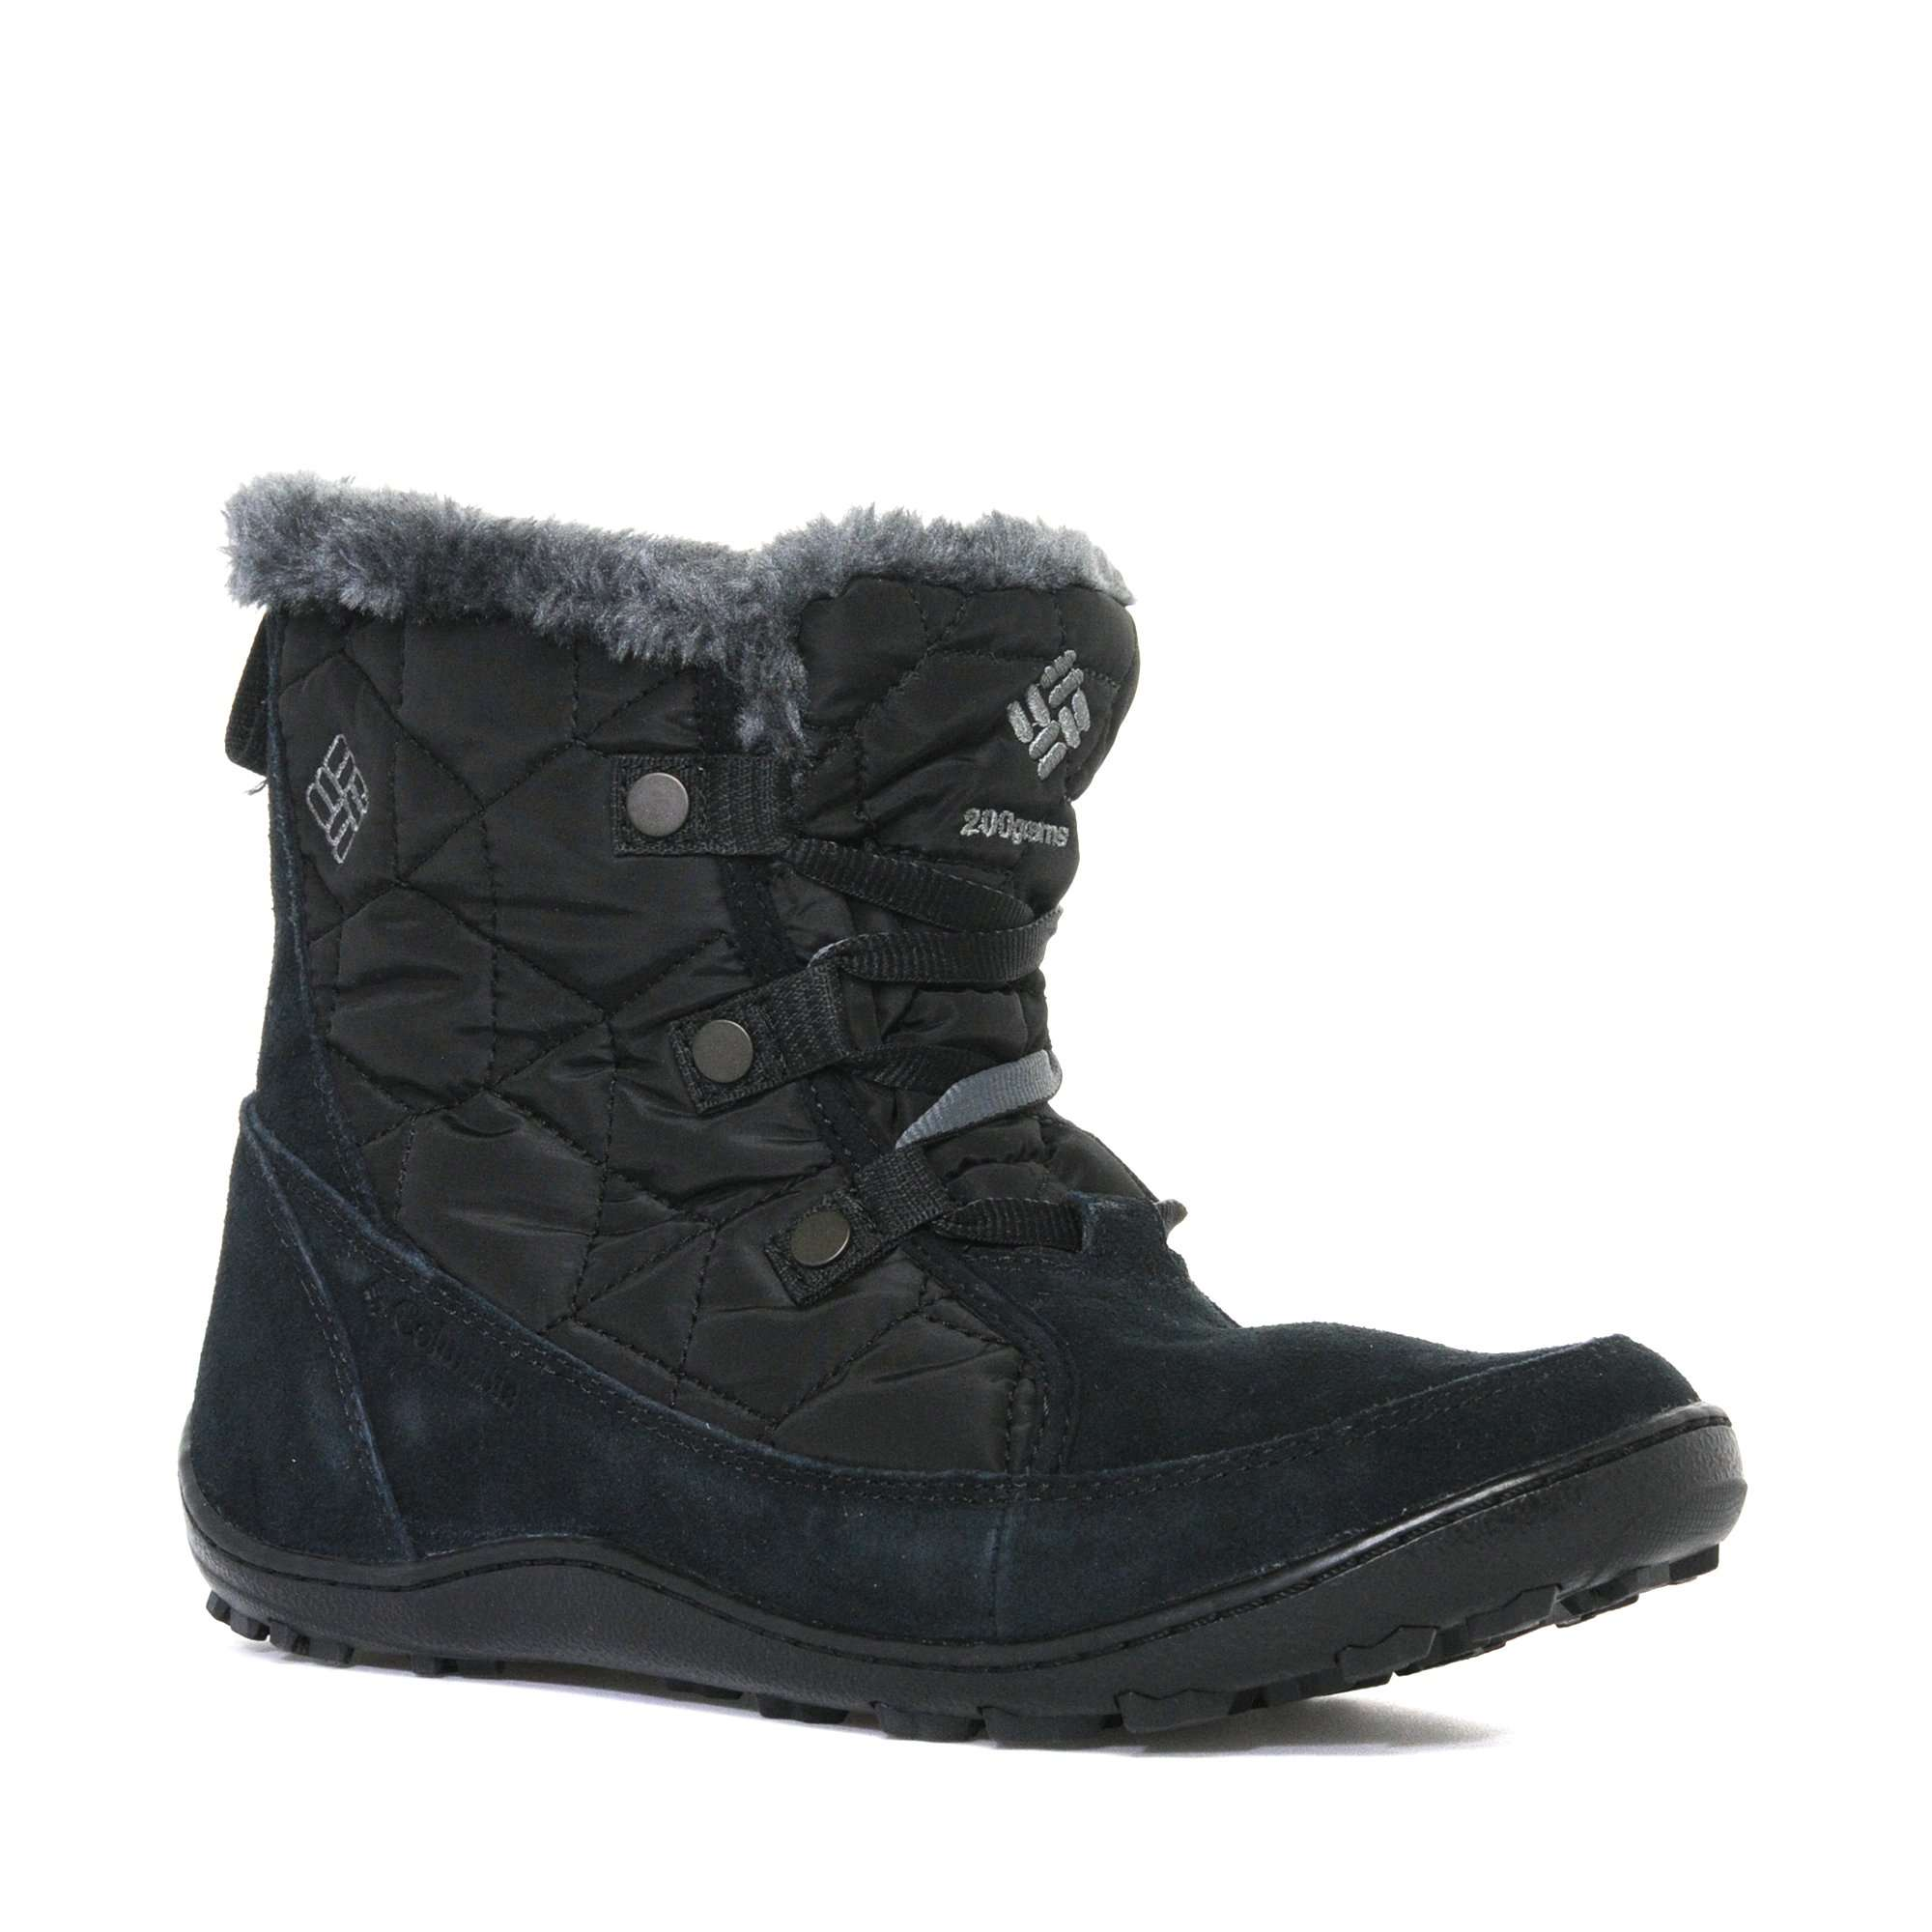 COLUMBIA Women's Minx Shorty Boots